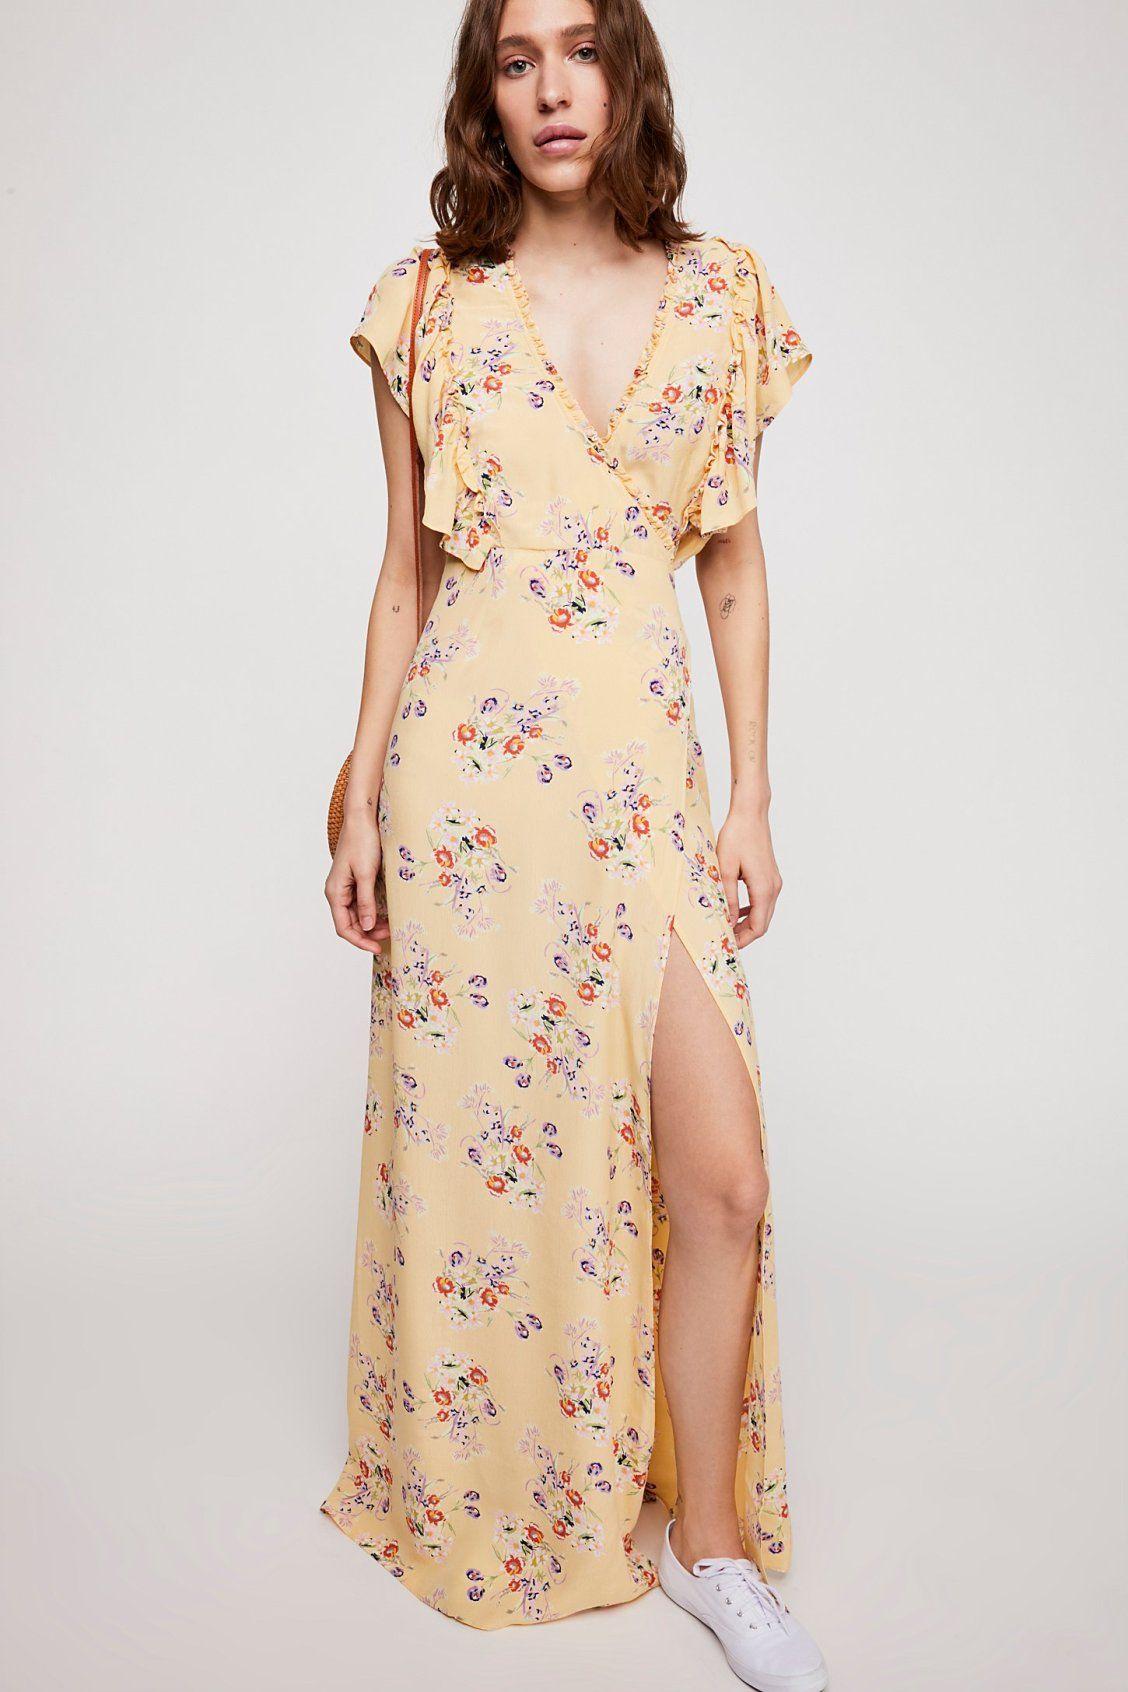 712ca629d874 Shiny Vintage Wrap Dress